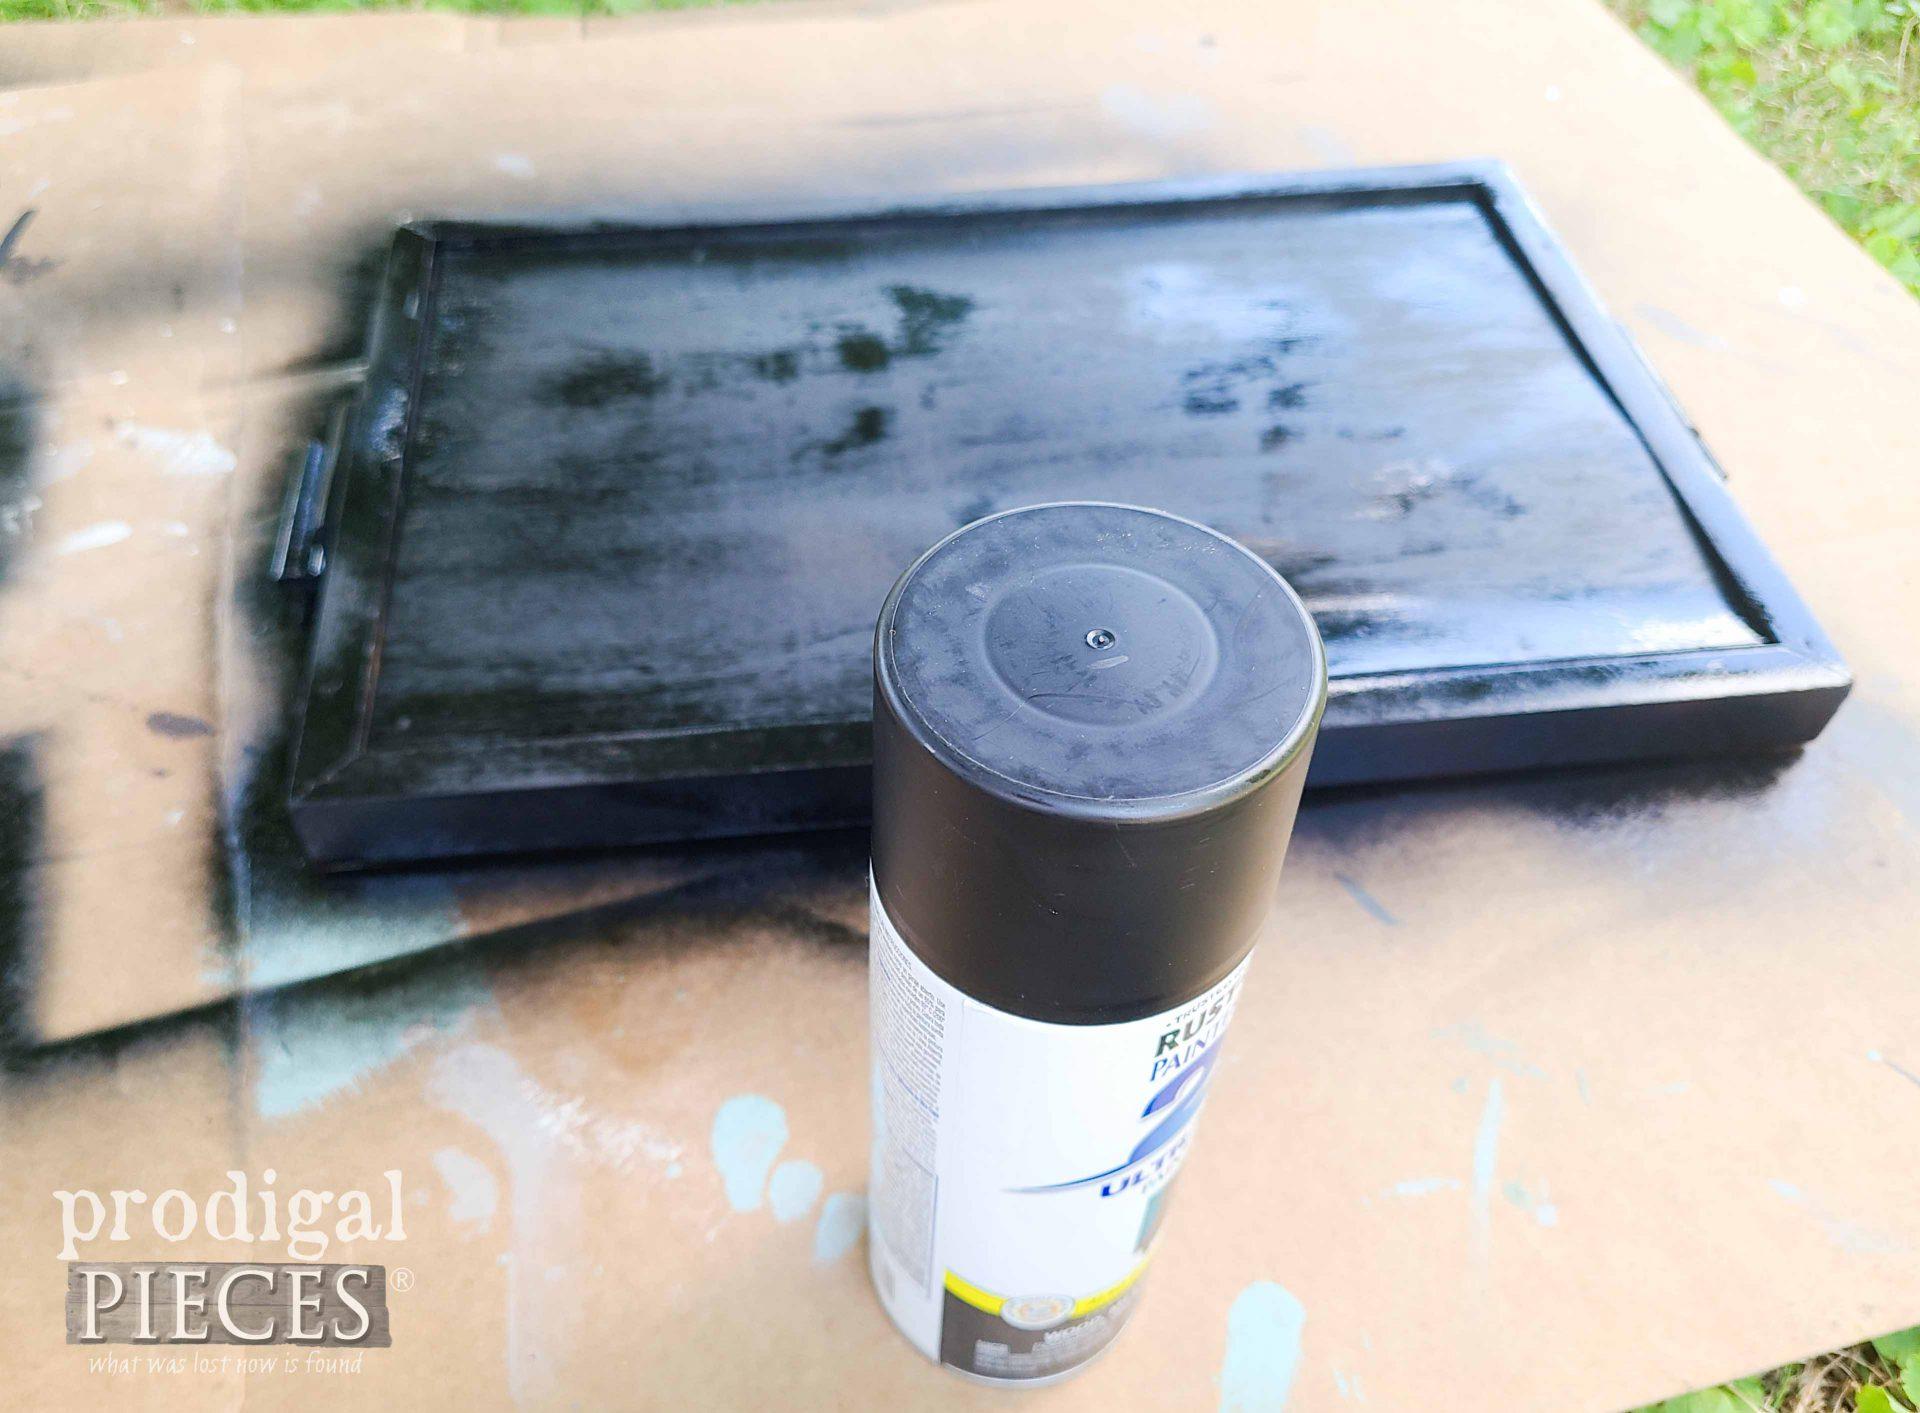 Spray Painting Serving Tray Frame Black | prodigalpieces.com